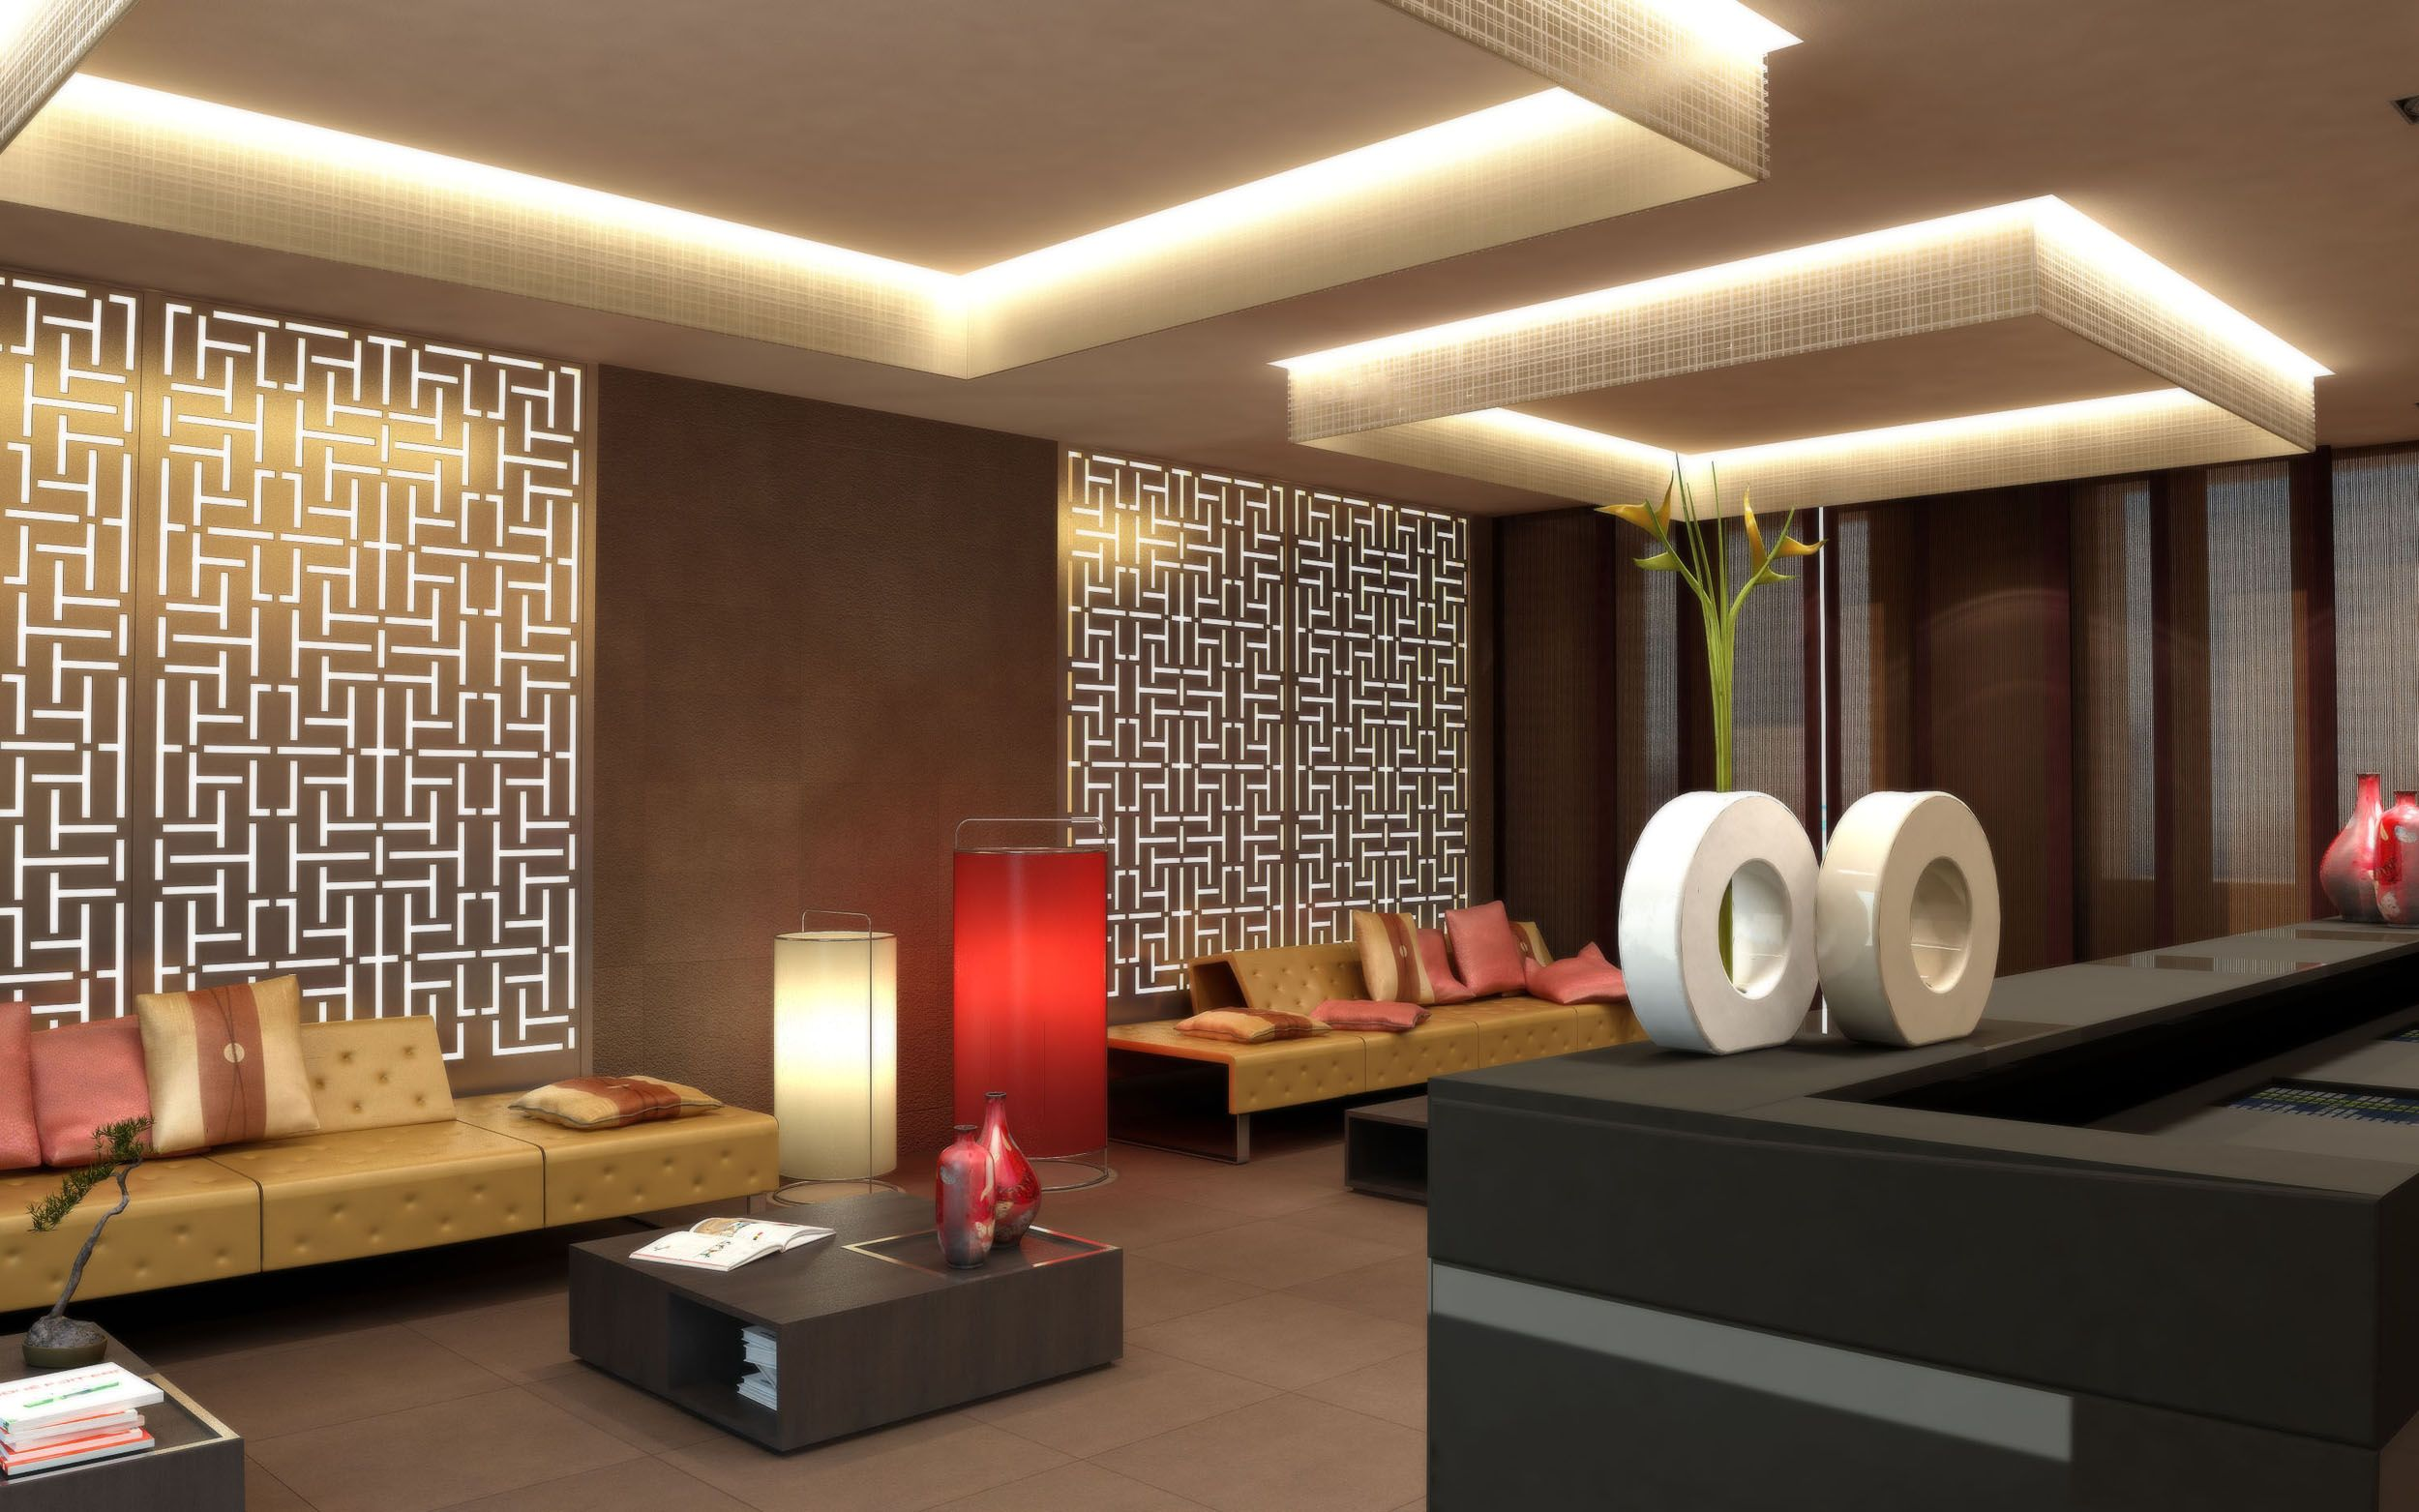 office interior cabin hd design design cool offices rh pinterest com